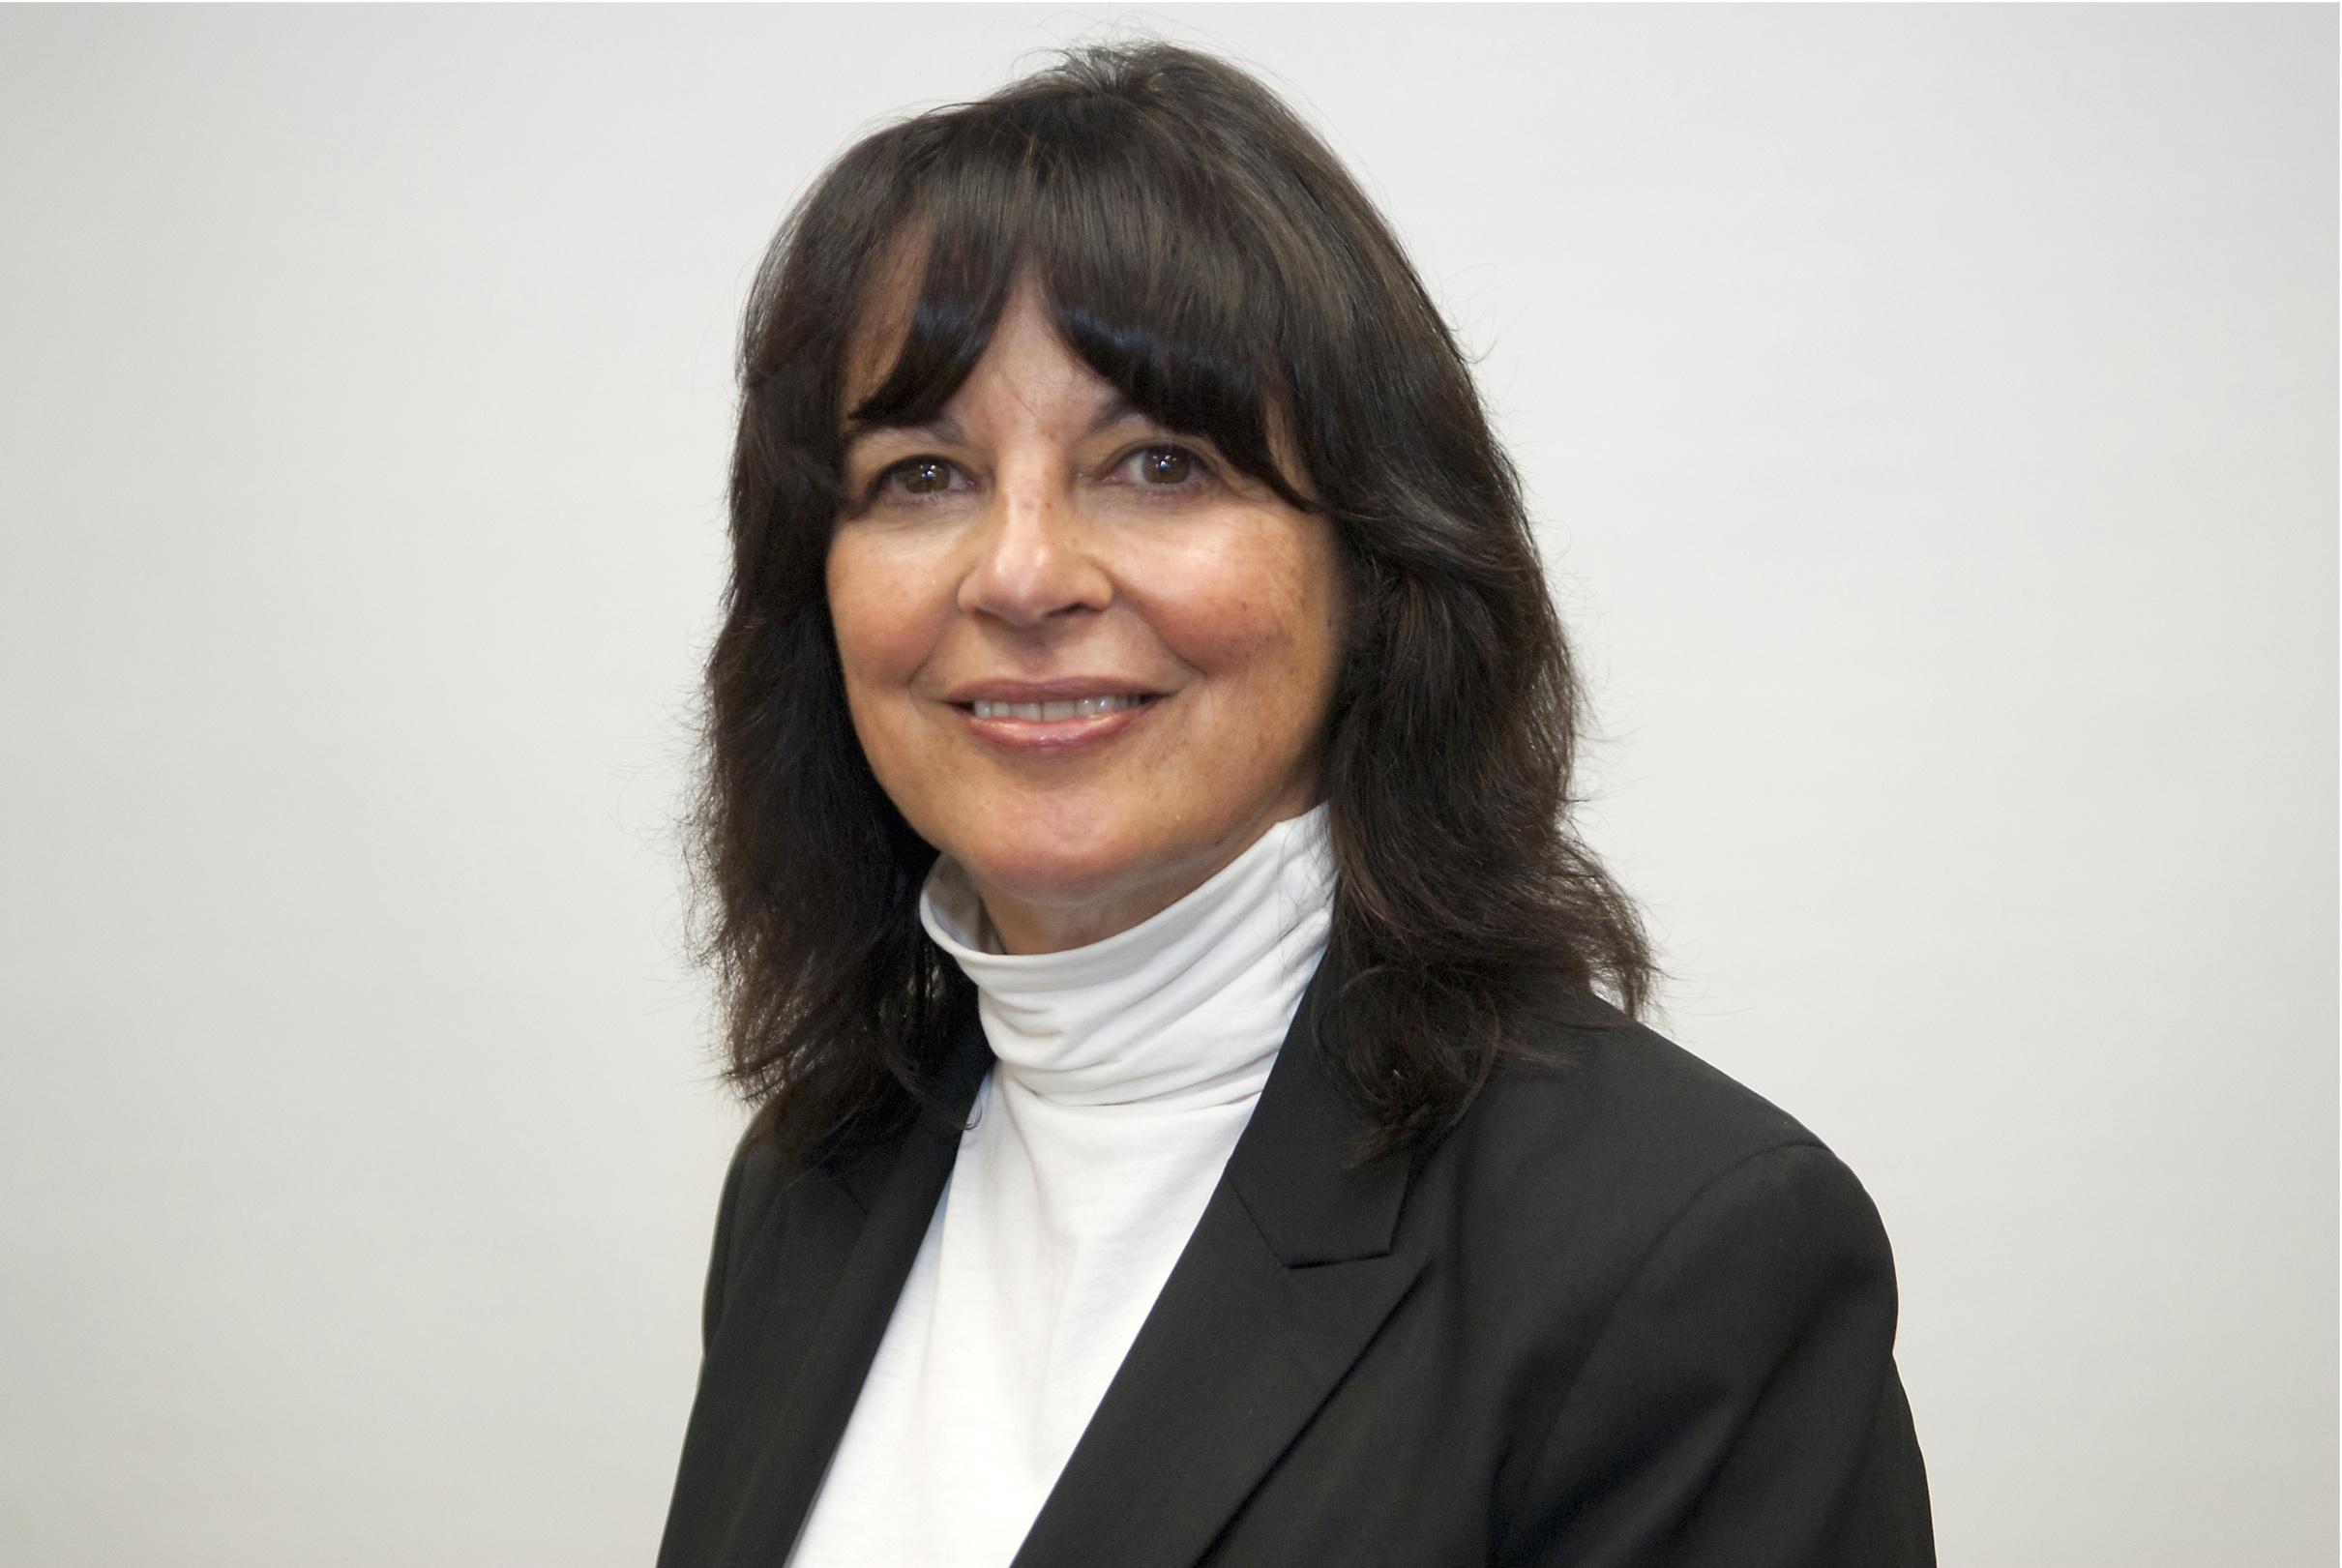 Professor Jacqueline K. Barton